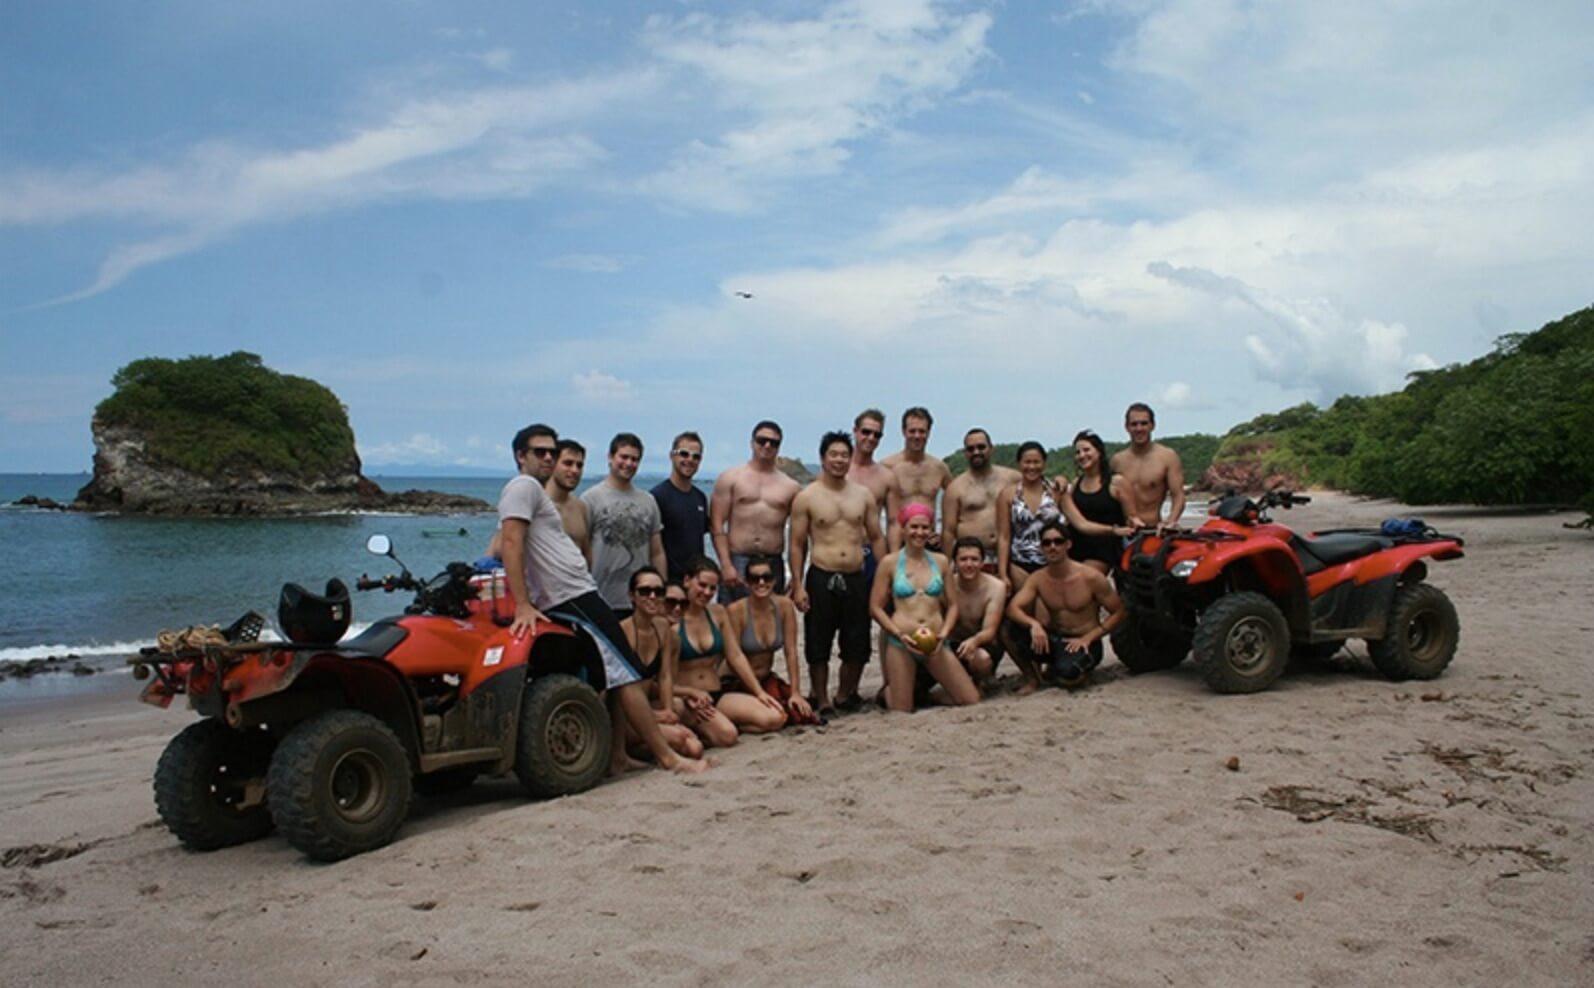 Tamarindo Guanacaste ATV adventure tour group relaxing on the beach